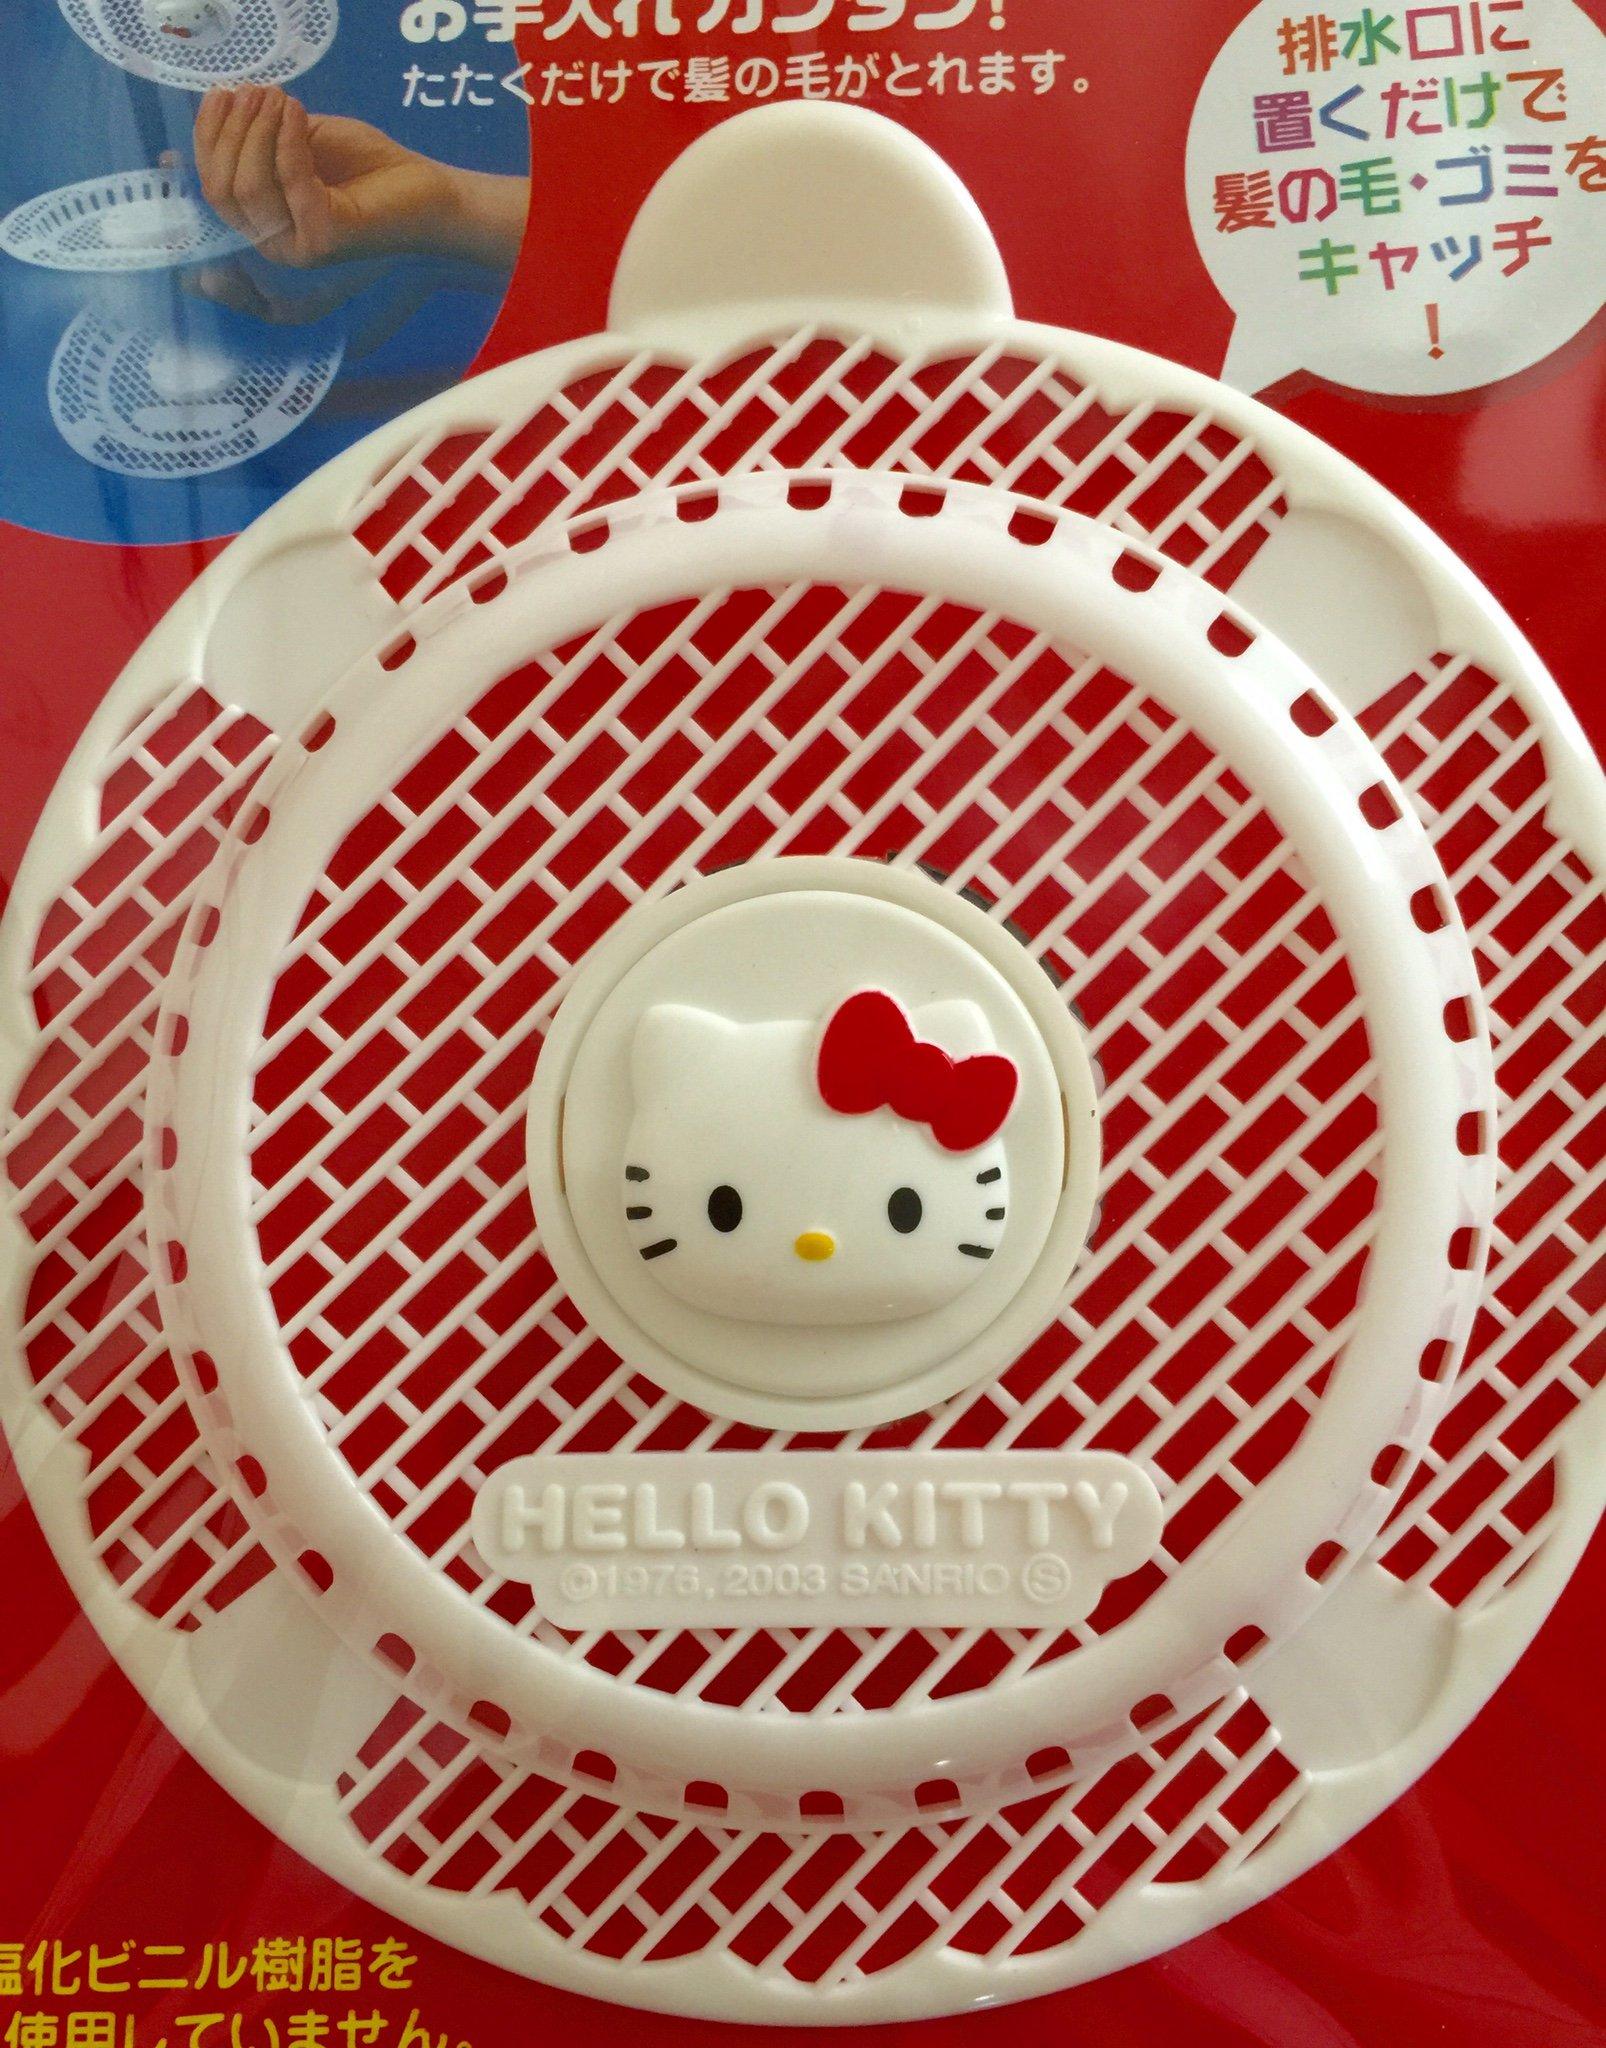 Hello Kitty Drain Strainer 4.6'' (Bottom Diameter3.35'')